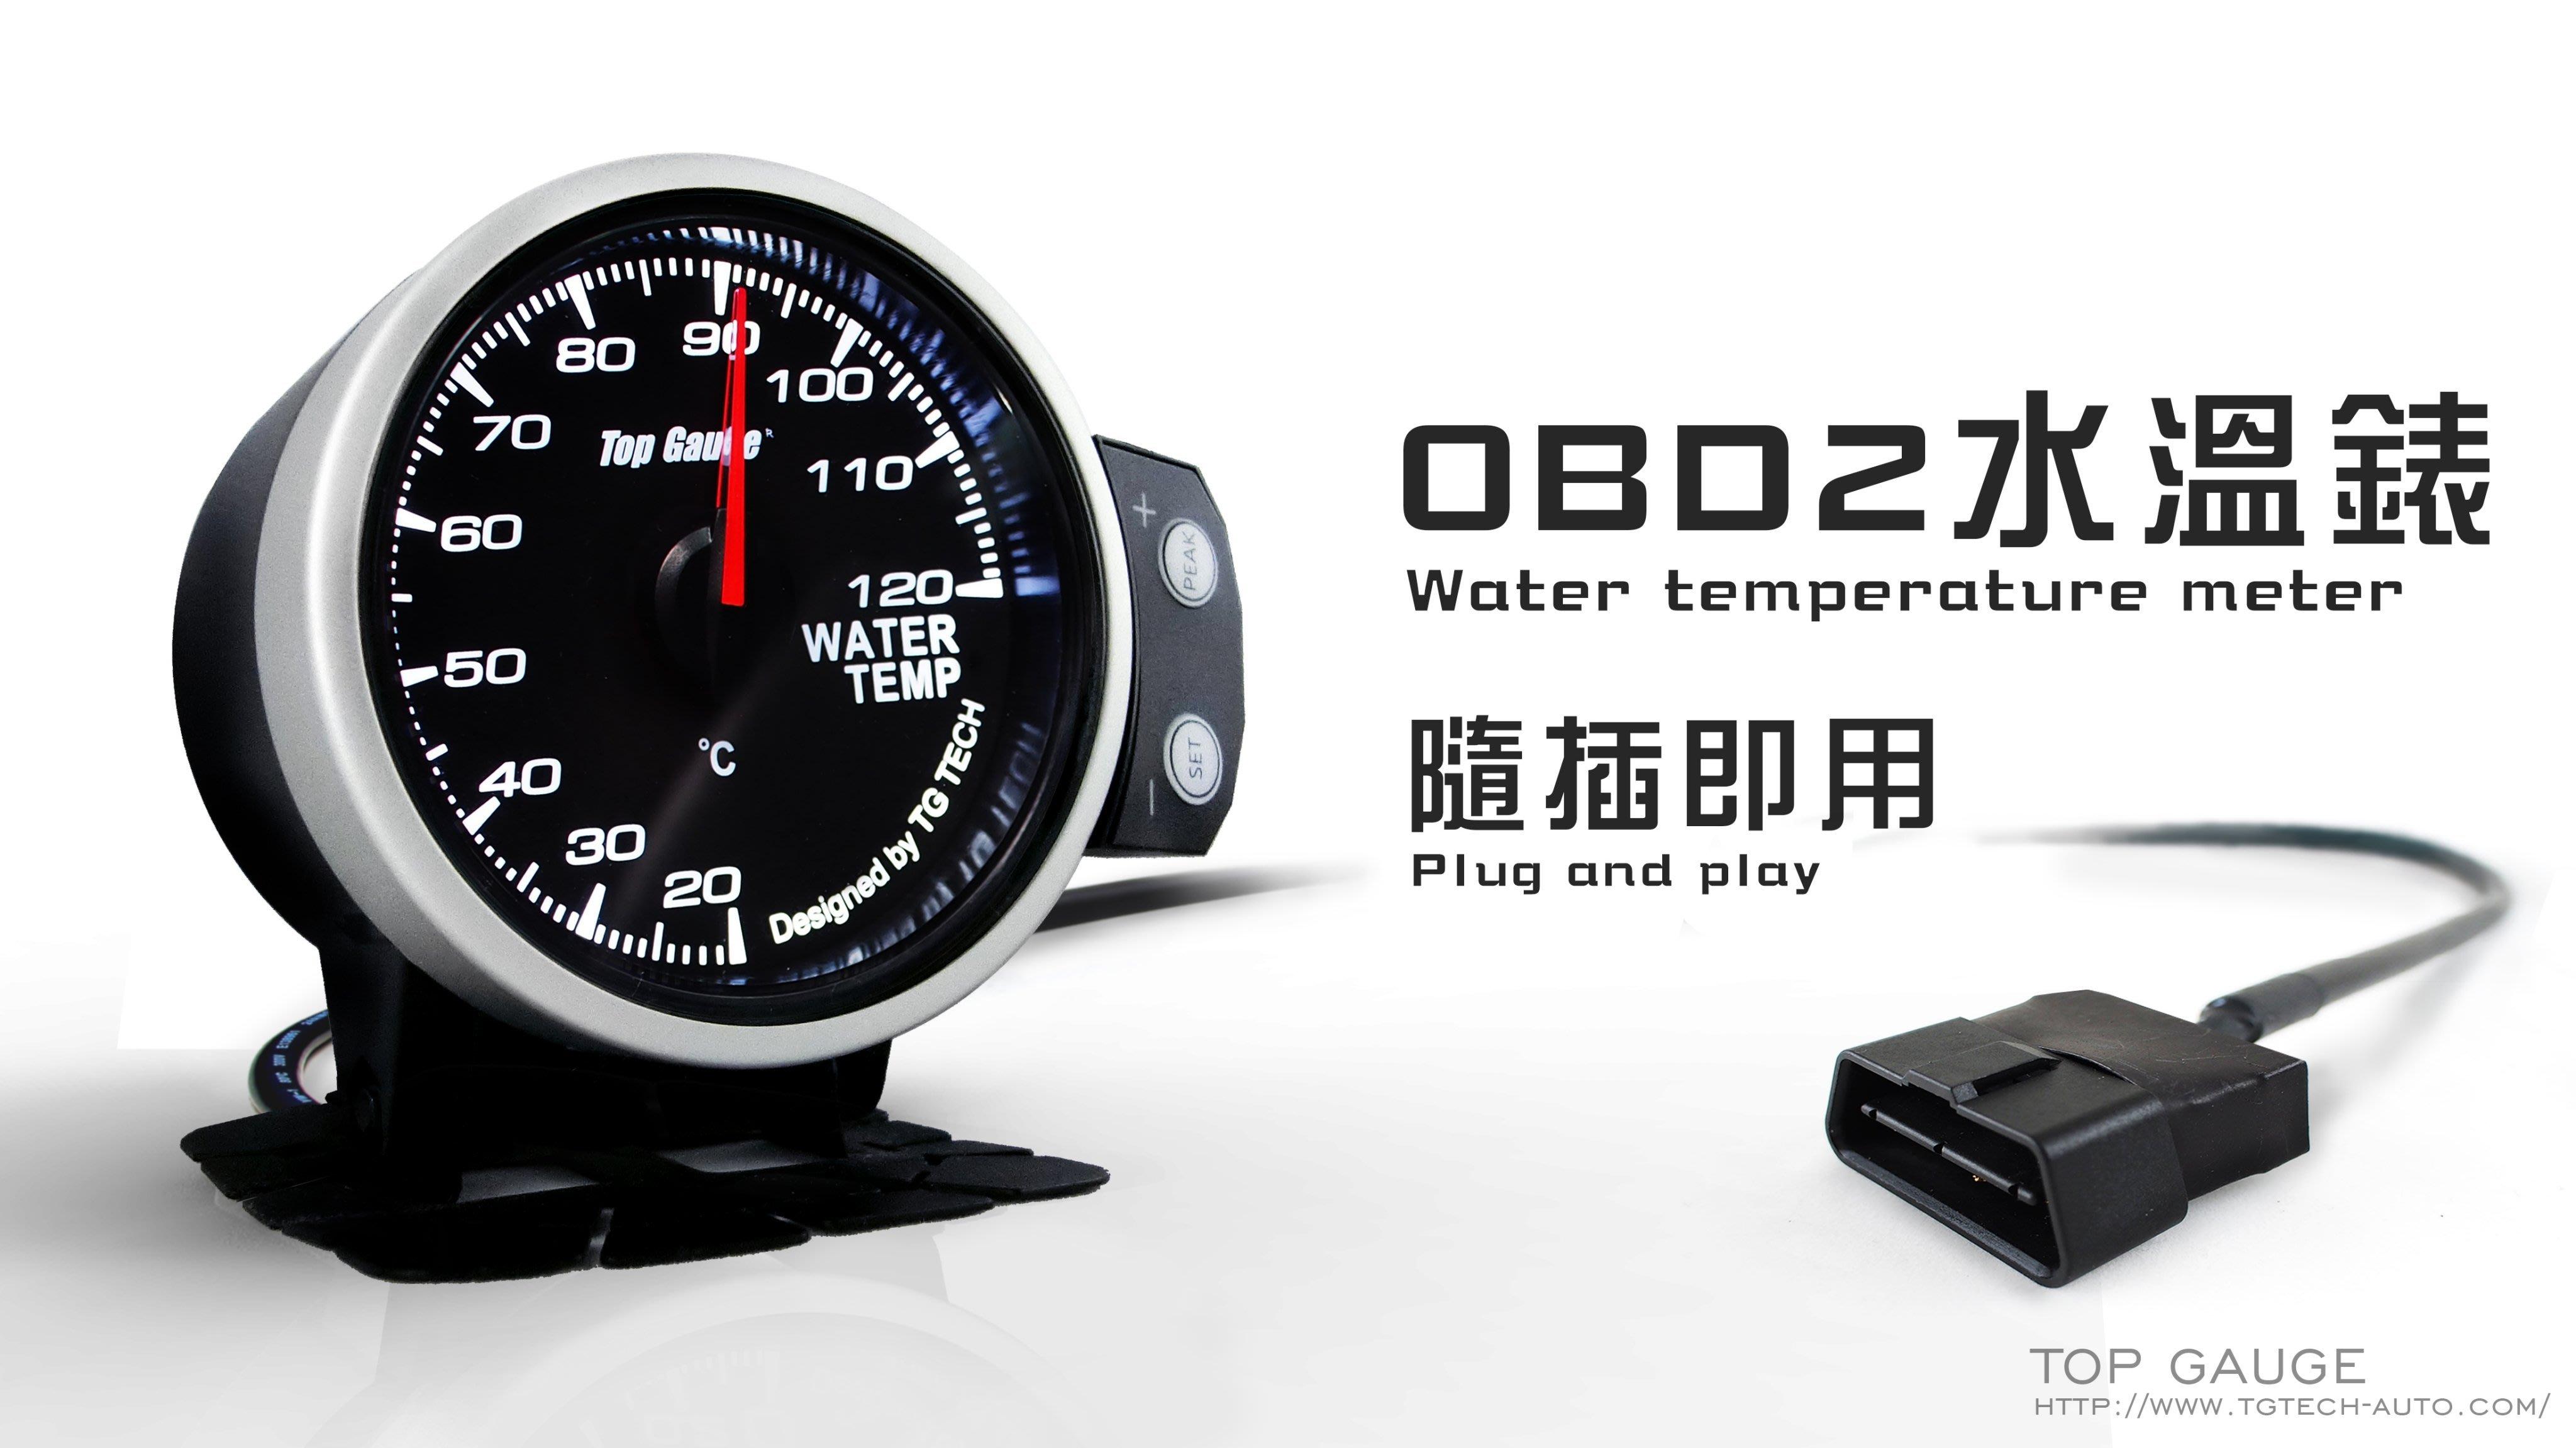 【精宇科技】TOYOTA ALTIS 專用 OBD2 OBDII 多功能水溫錶 52MM 60MM